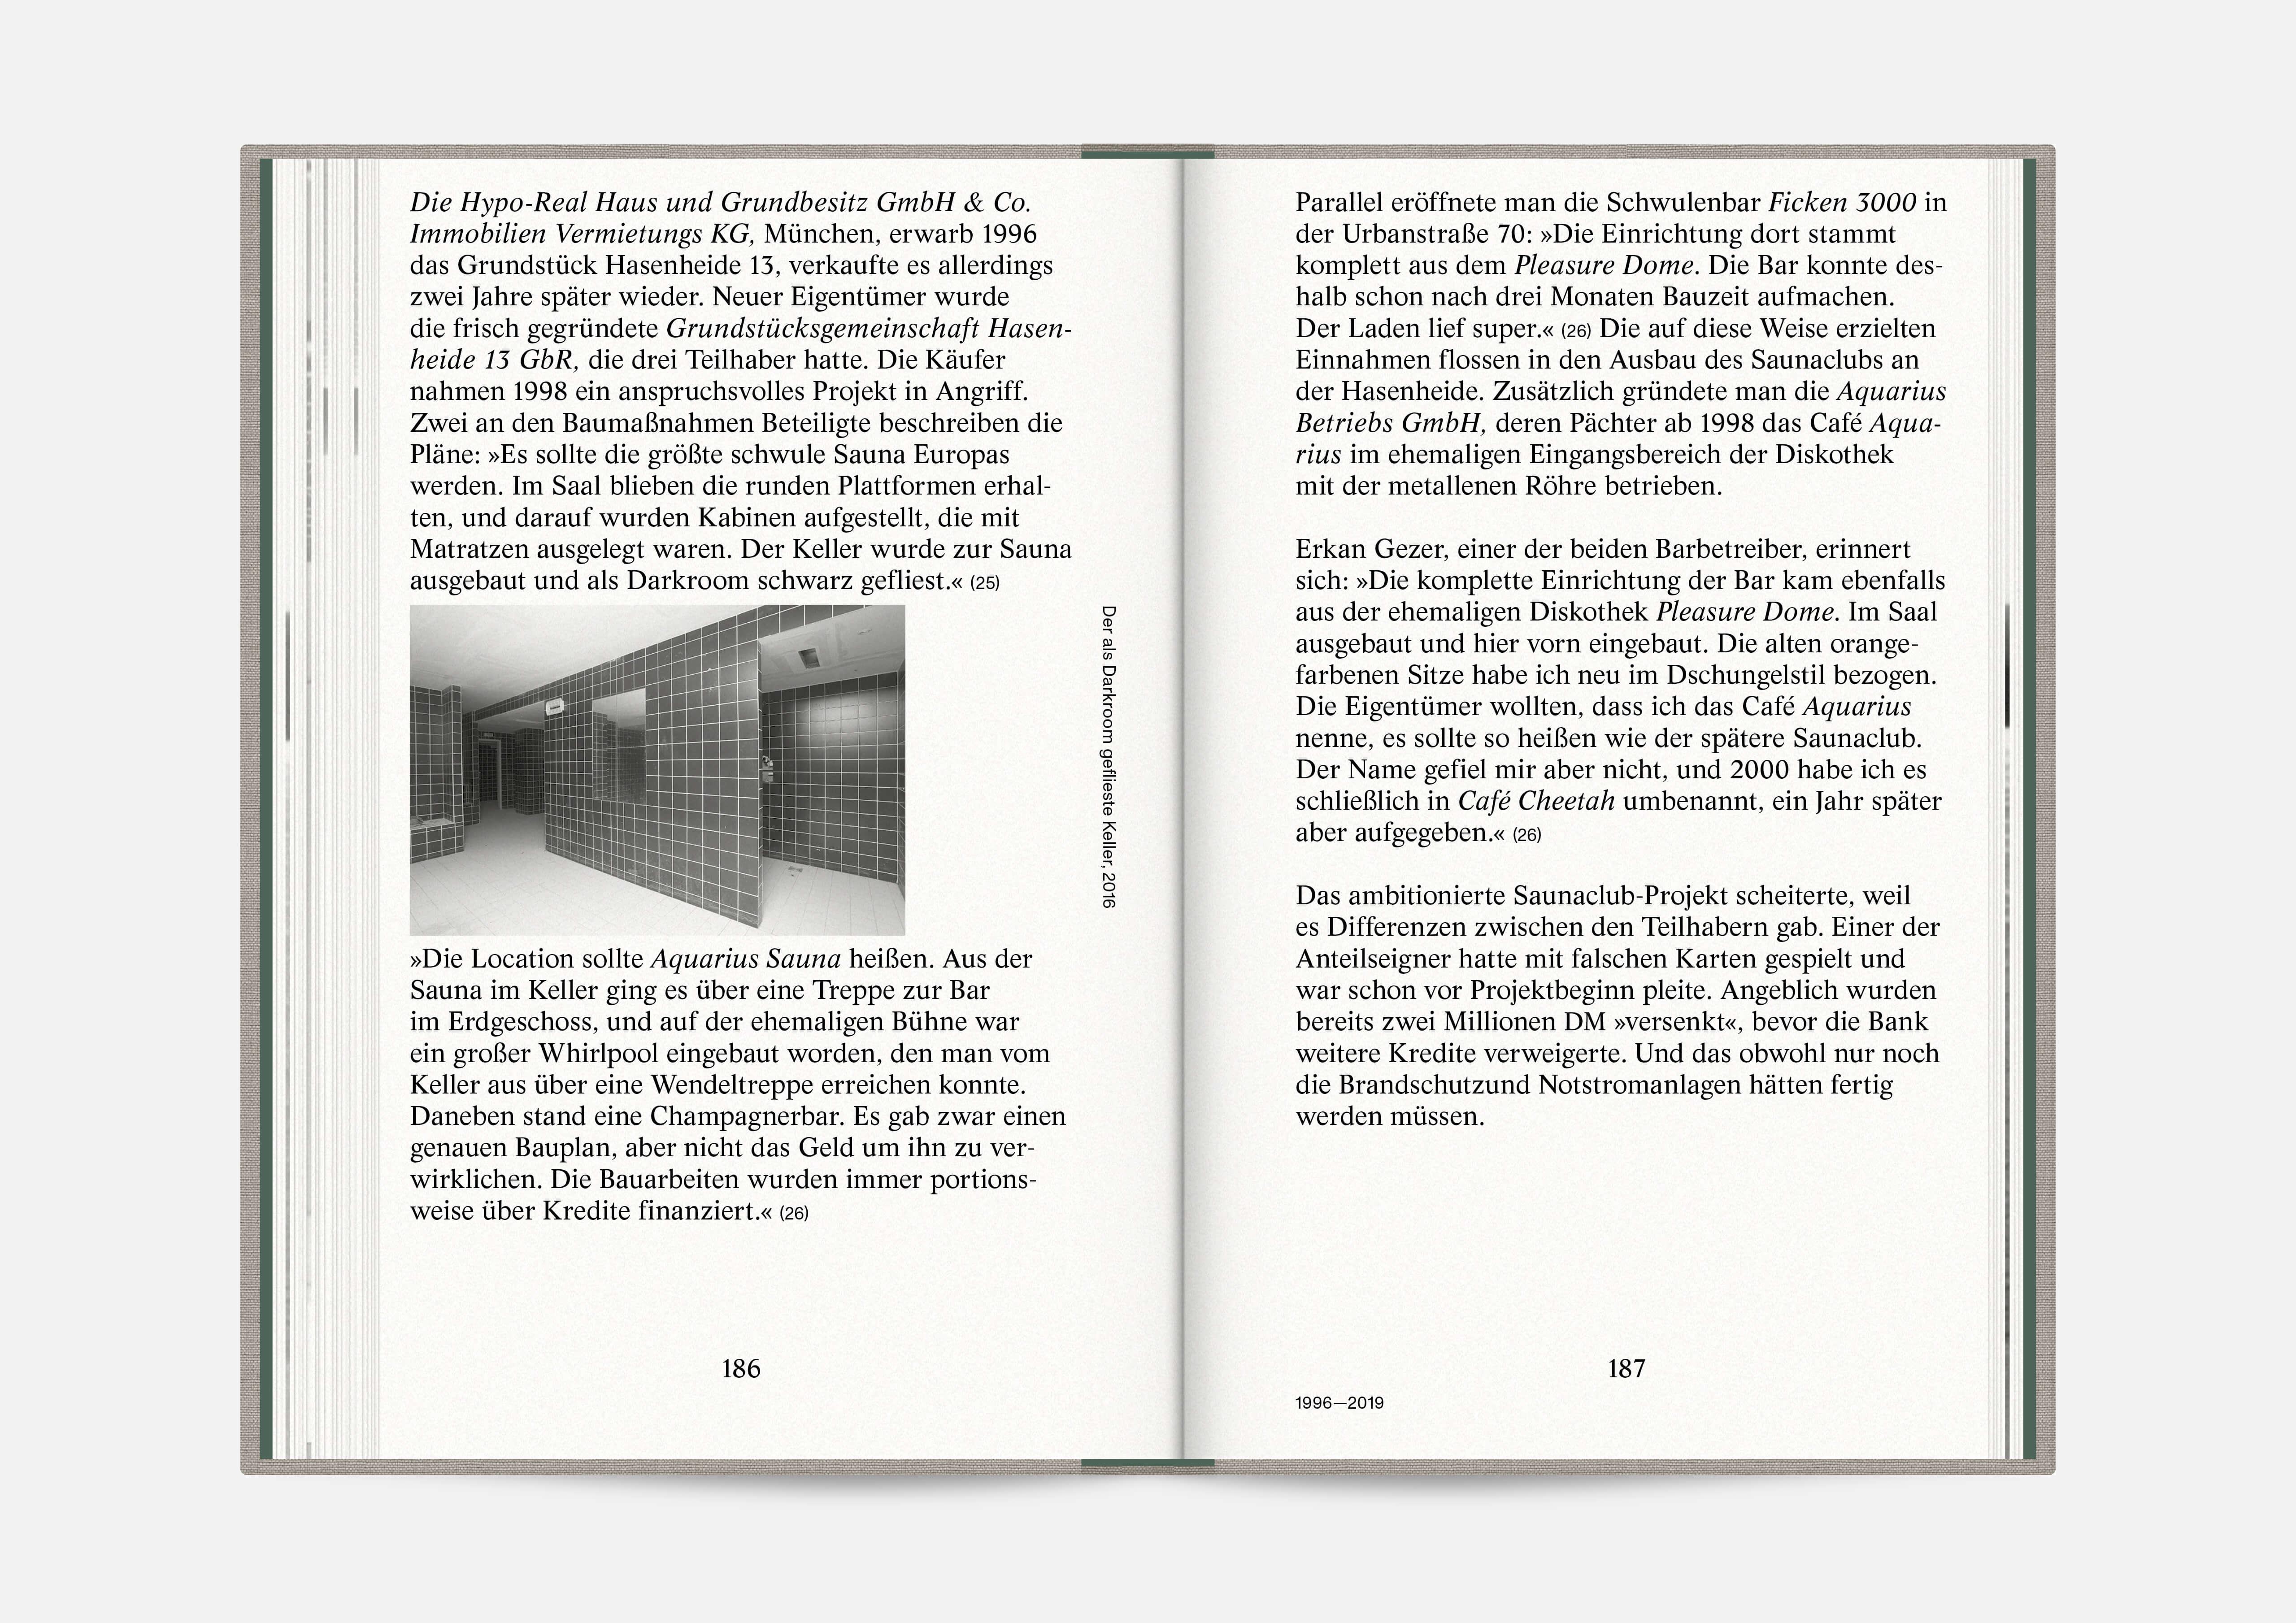 https://neuegestaltung.de/media/pages/clients/sammlung-wemhoner-hasenheide-13/fc22bb4d24-1628761385/sw-hasenheide_33.jpg